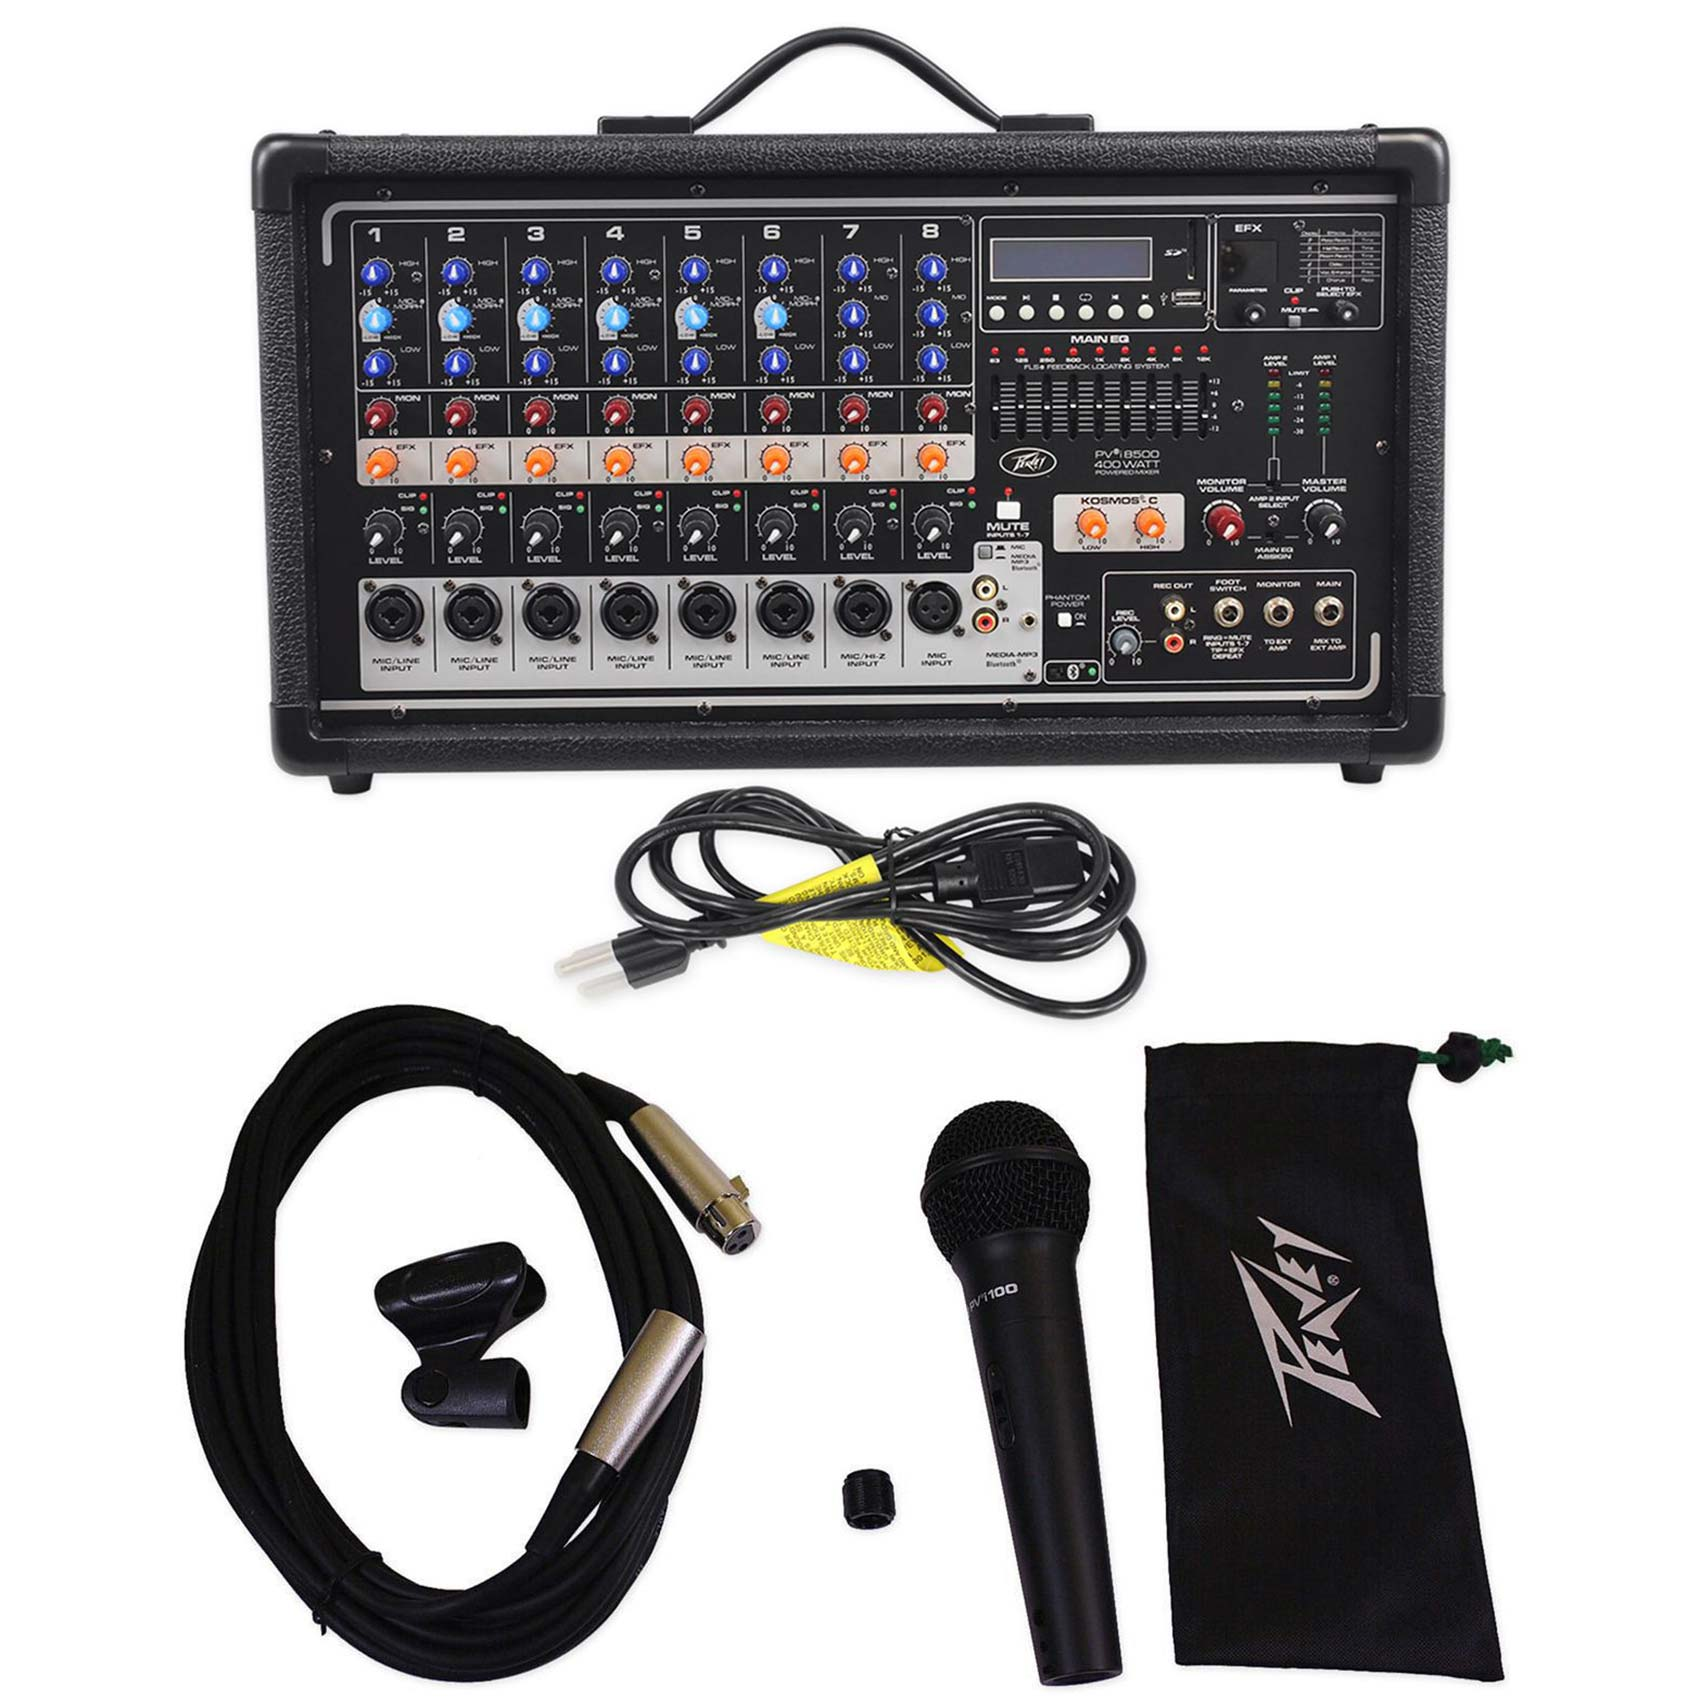 Peavey Pvi8500 400W 8-Ch. Powered Live Sound Mixer w/Bluetooth+Peavey Microphone